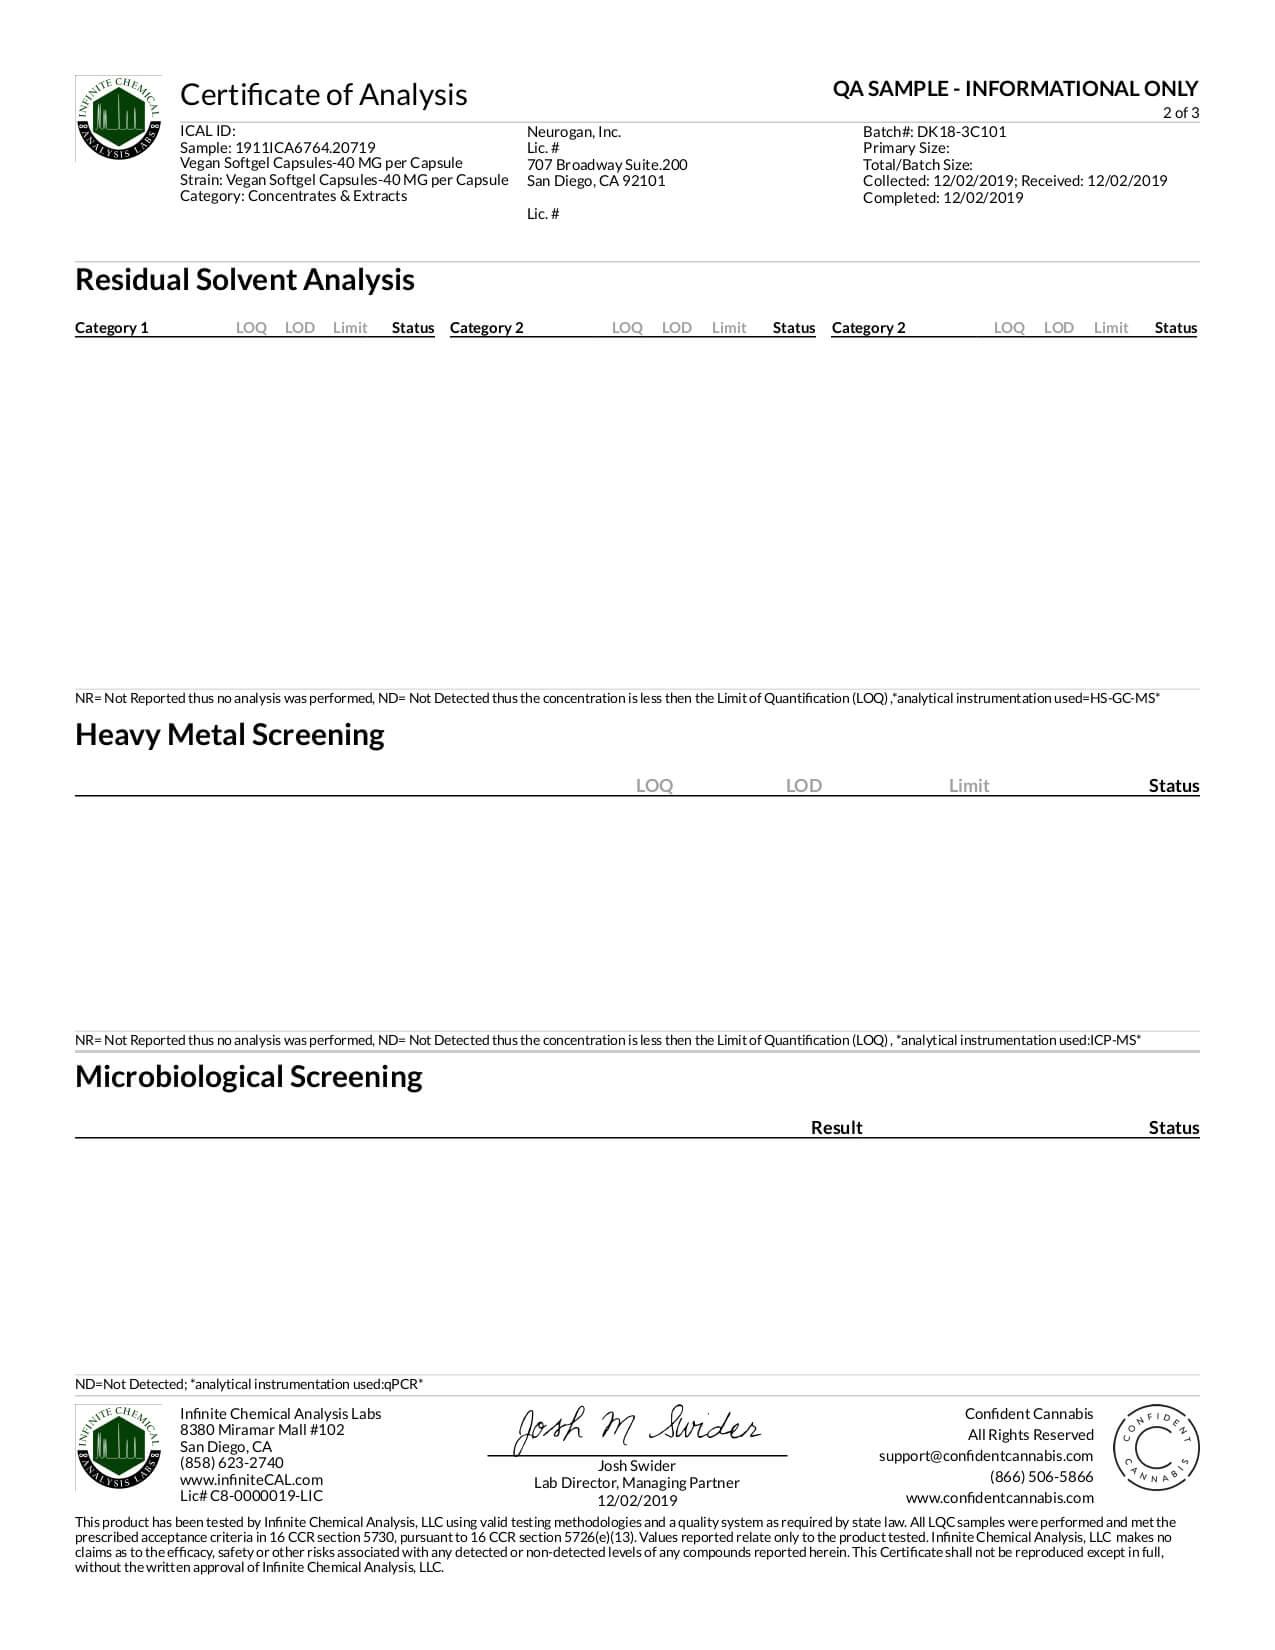 Neurogan, Inc. CBD Softgels Full Spectrum Softgels Lab Report